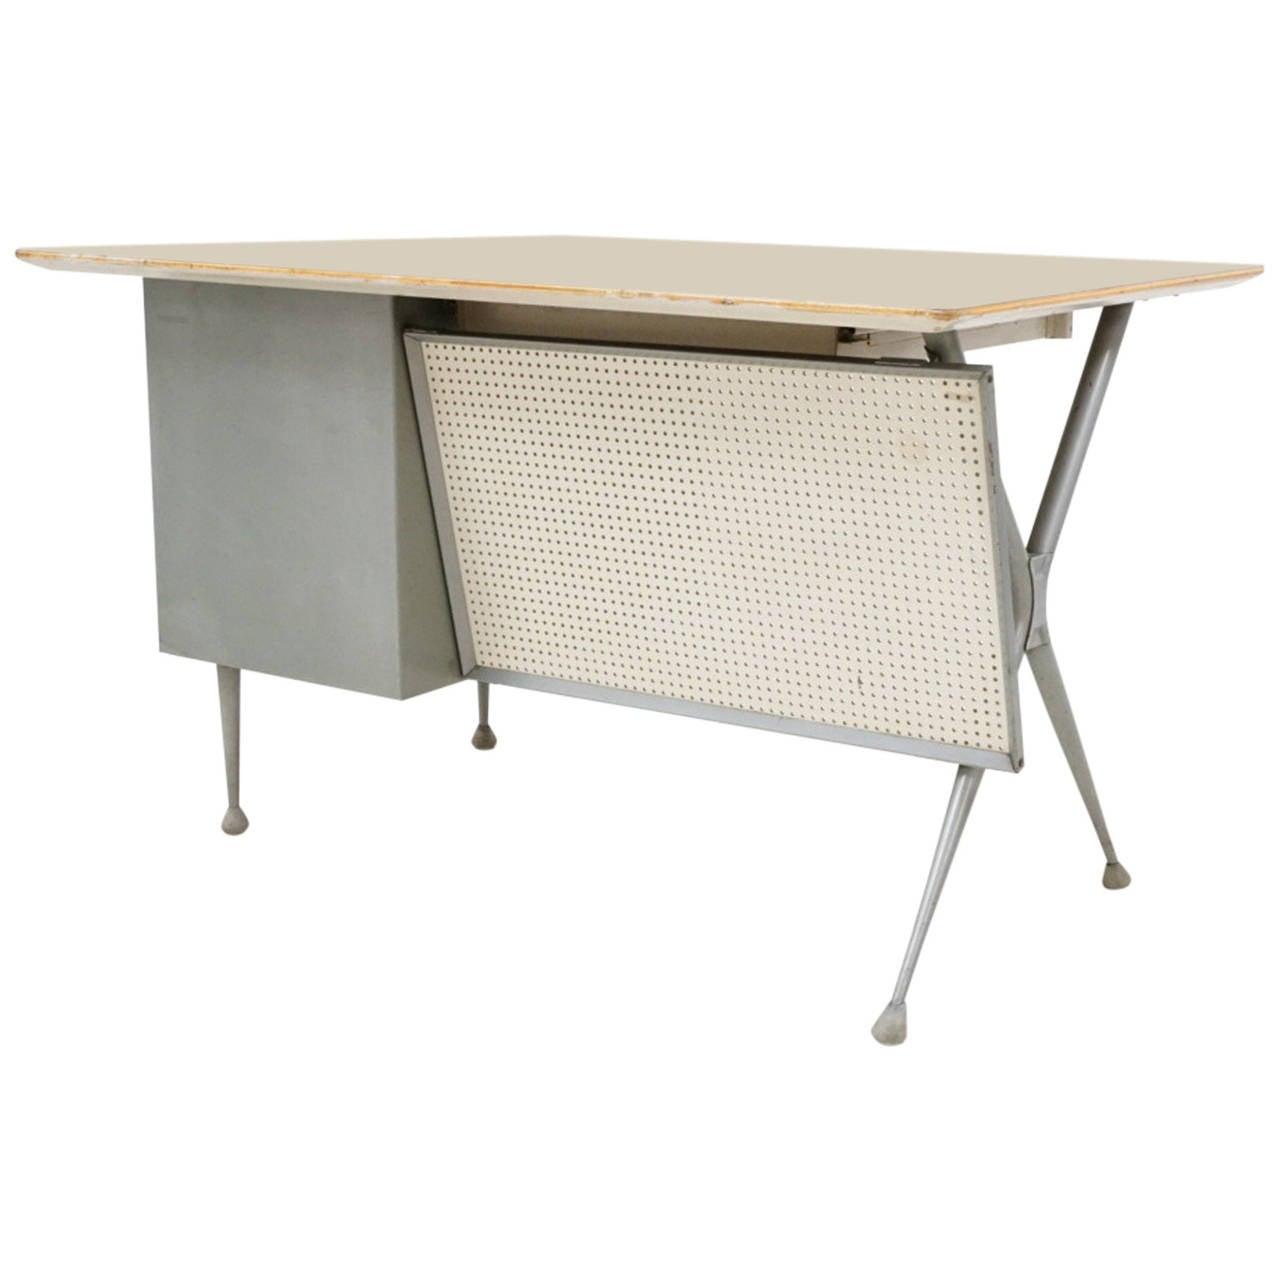 Rare Raymond Loewy Desk at 1stdibs